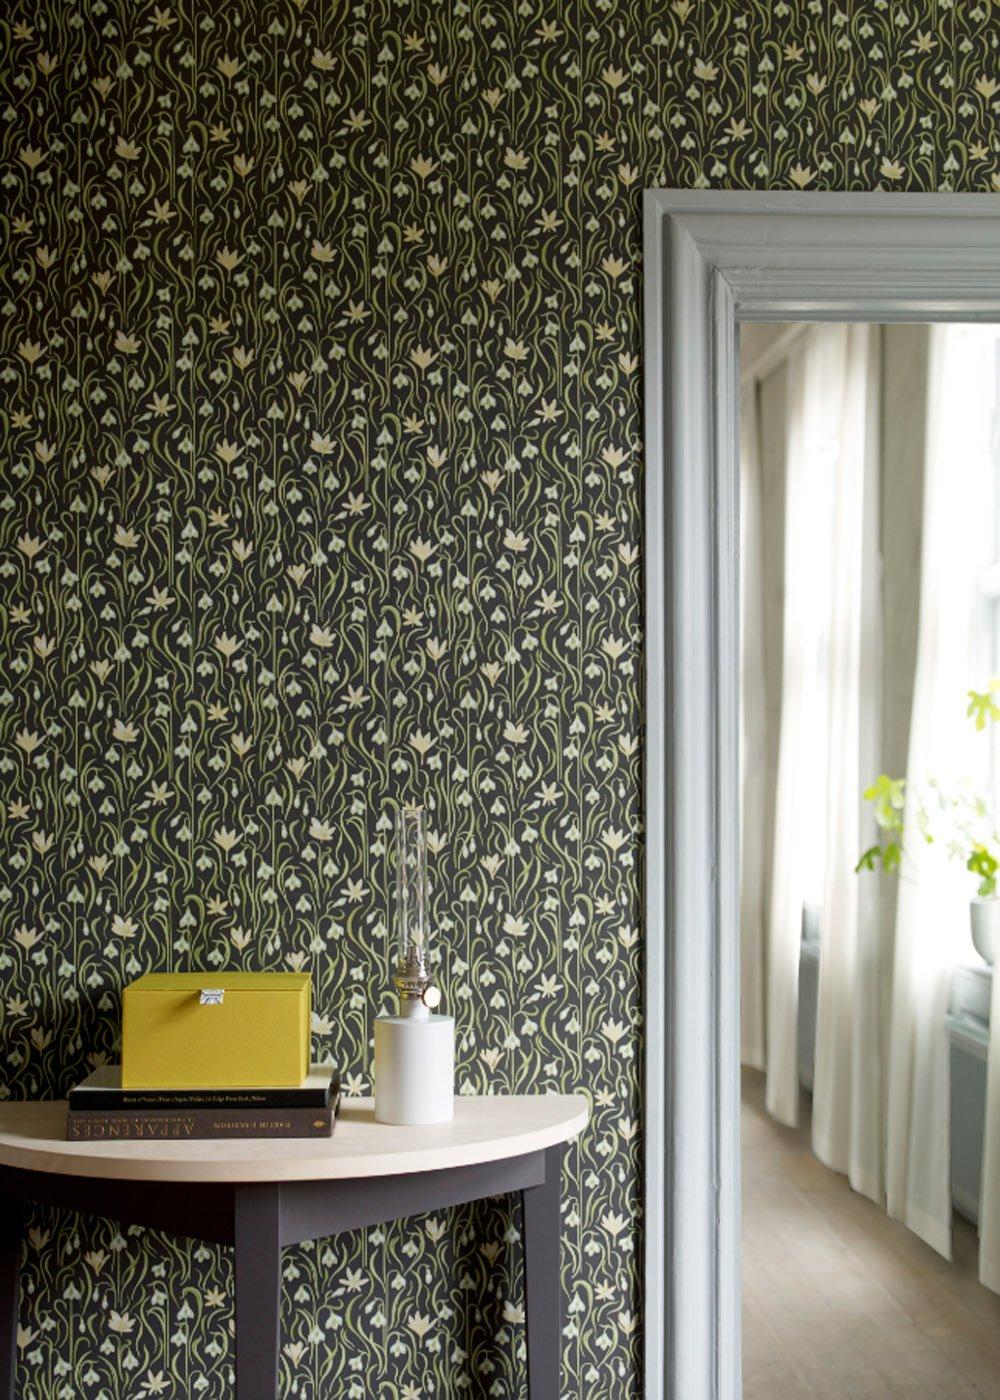 Inspiration  le papier peint fleuri ou  motif vgtal